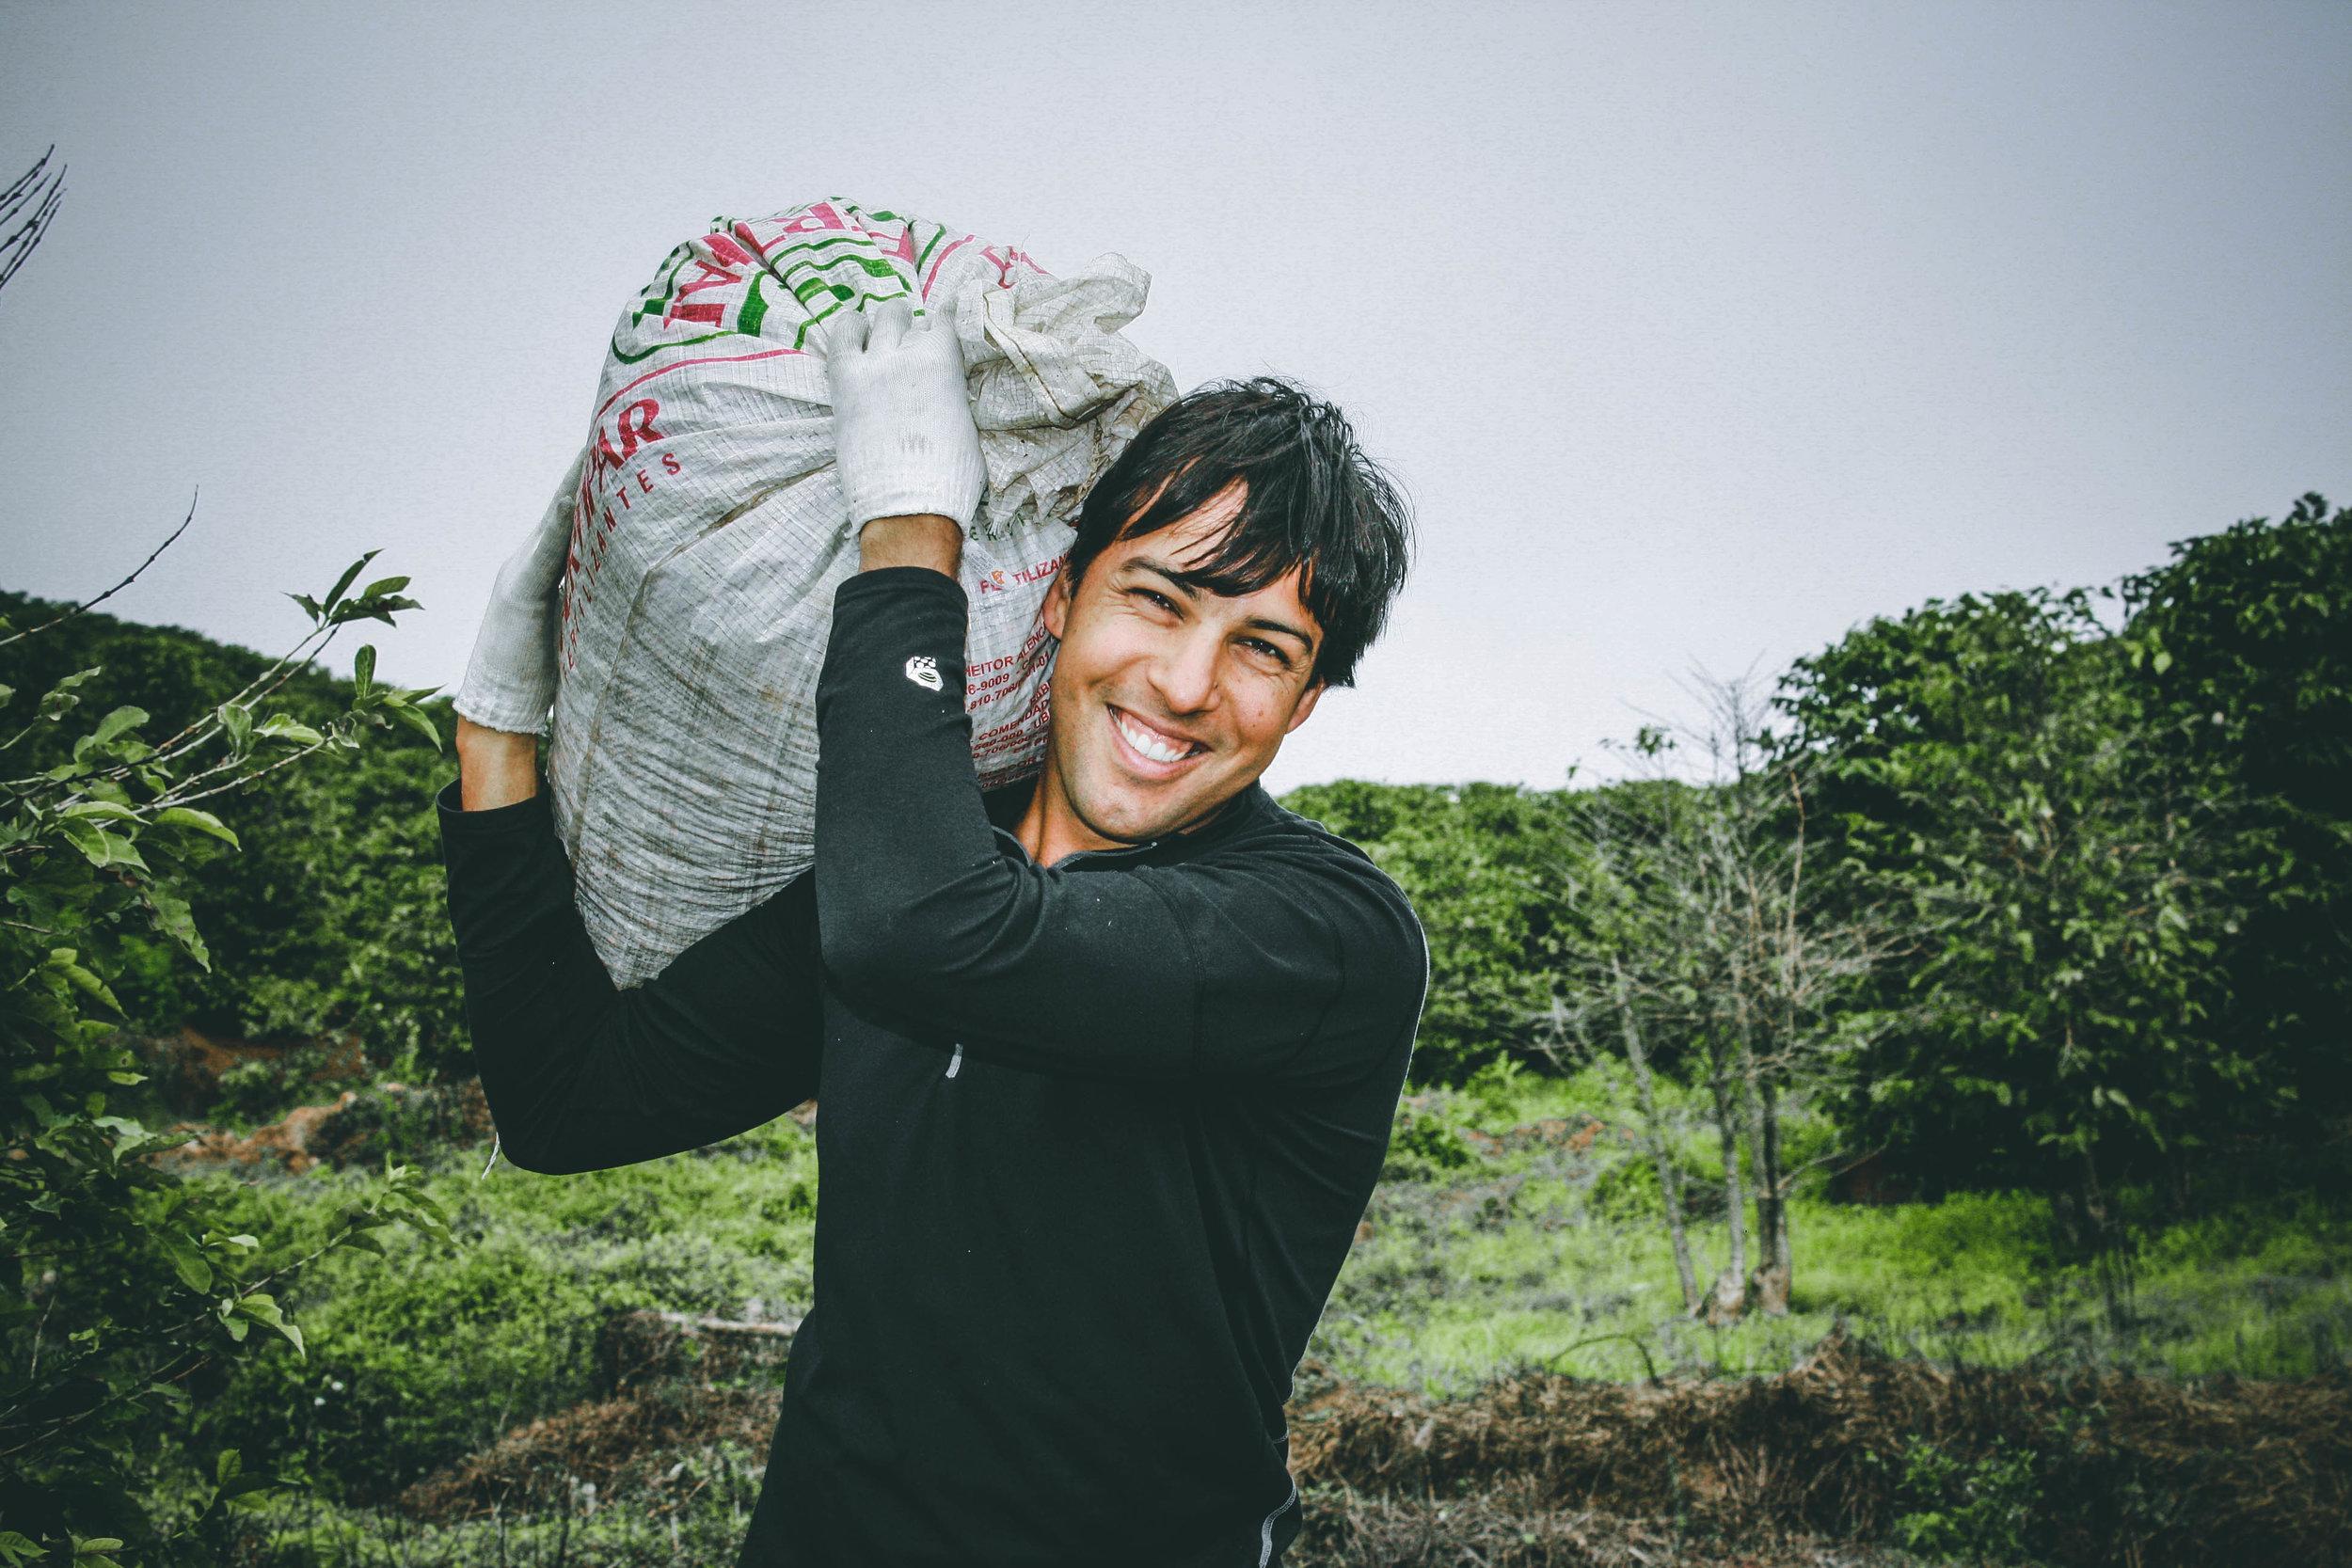 Augusto-carrying-coffee-Brazil-edit.jpg